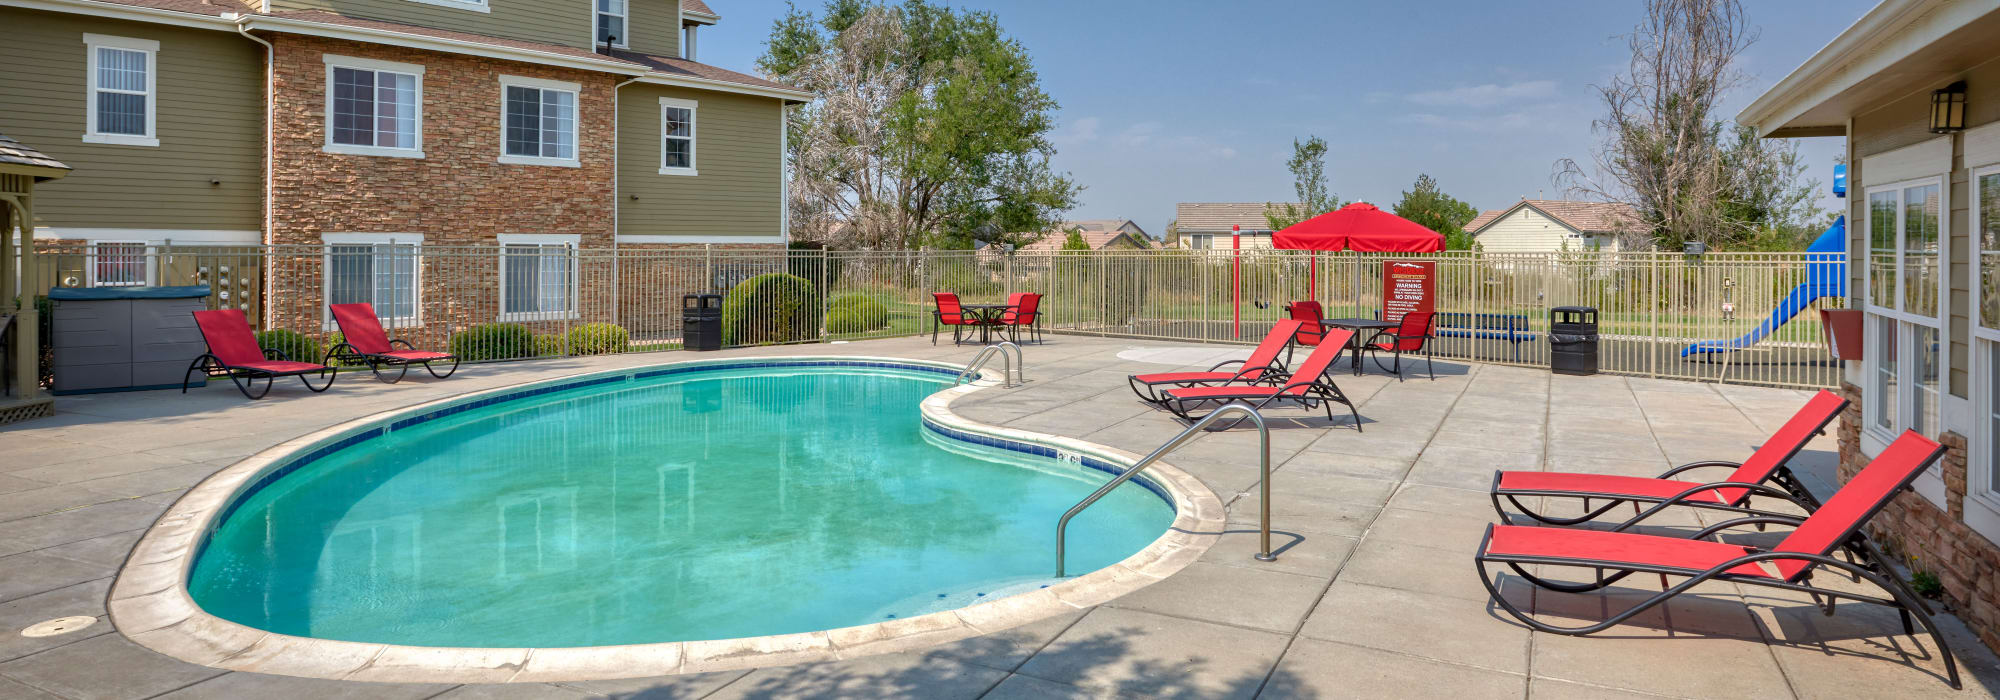 Reviews at Westridge Apartments in Aurora, Colorado